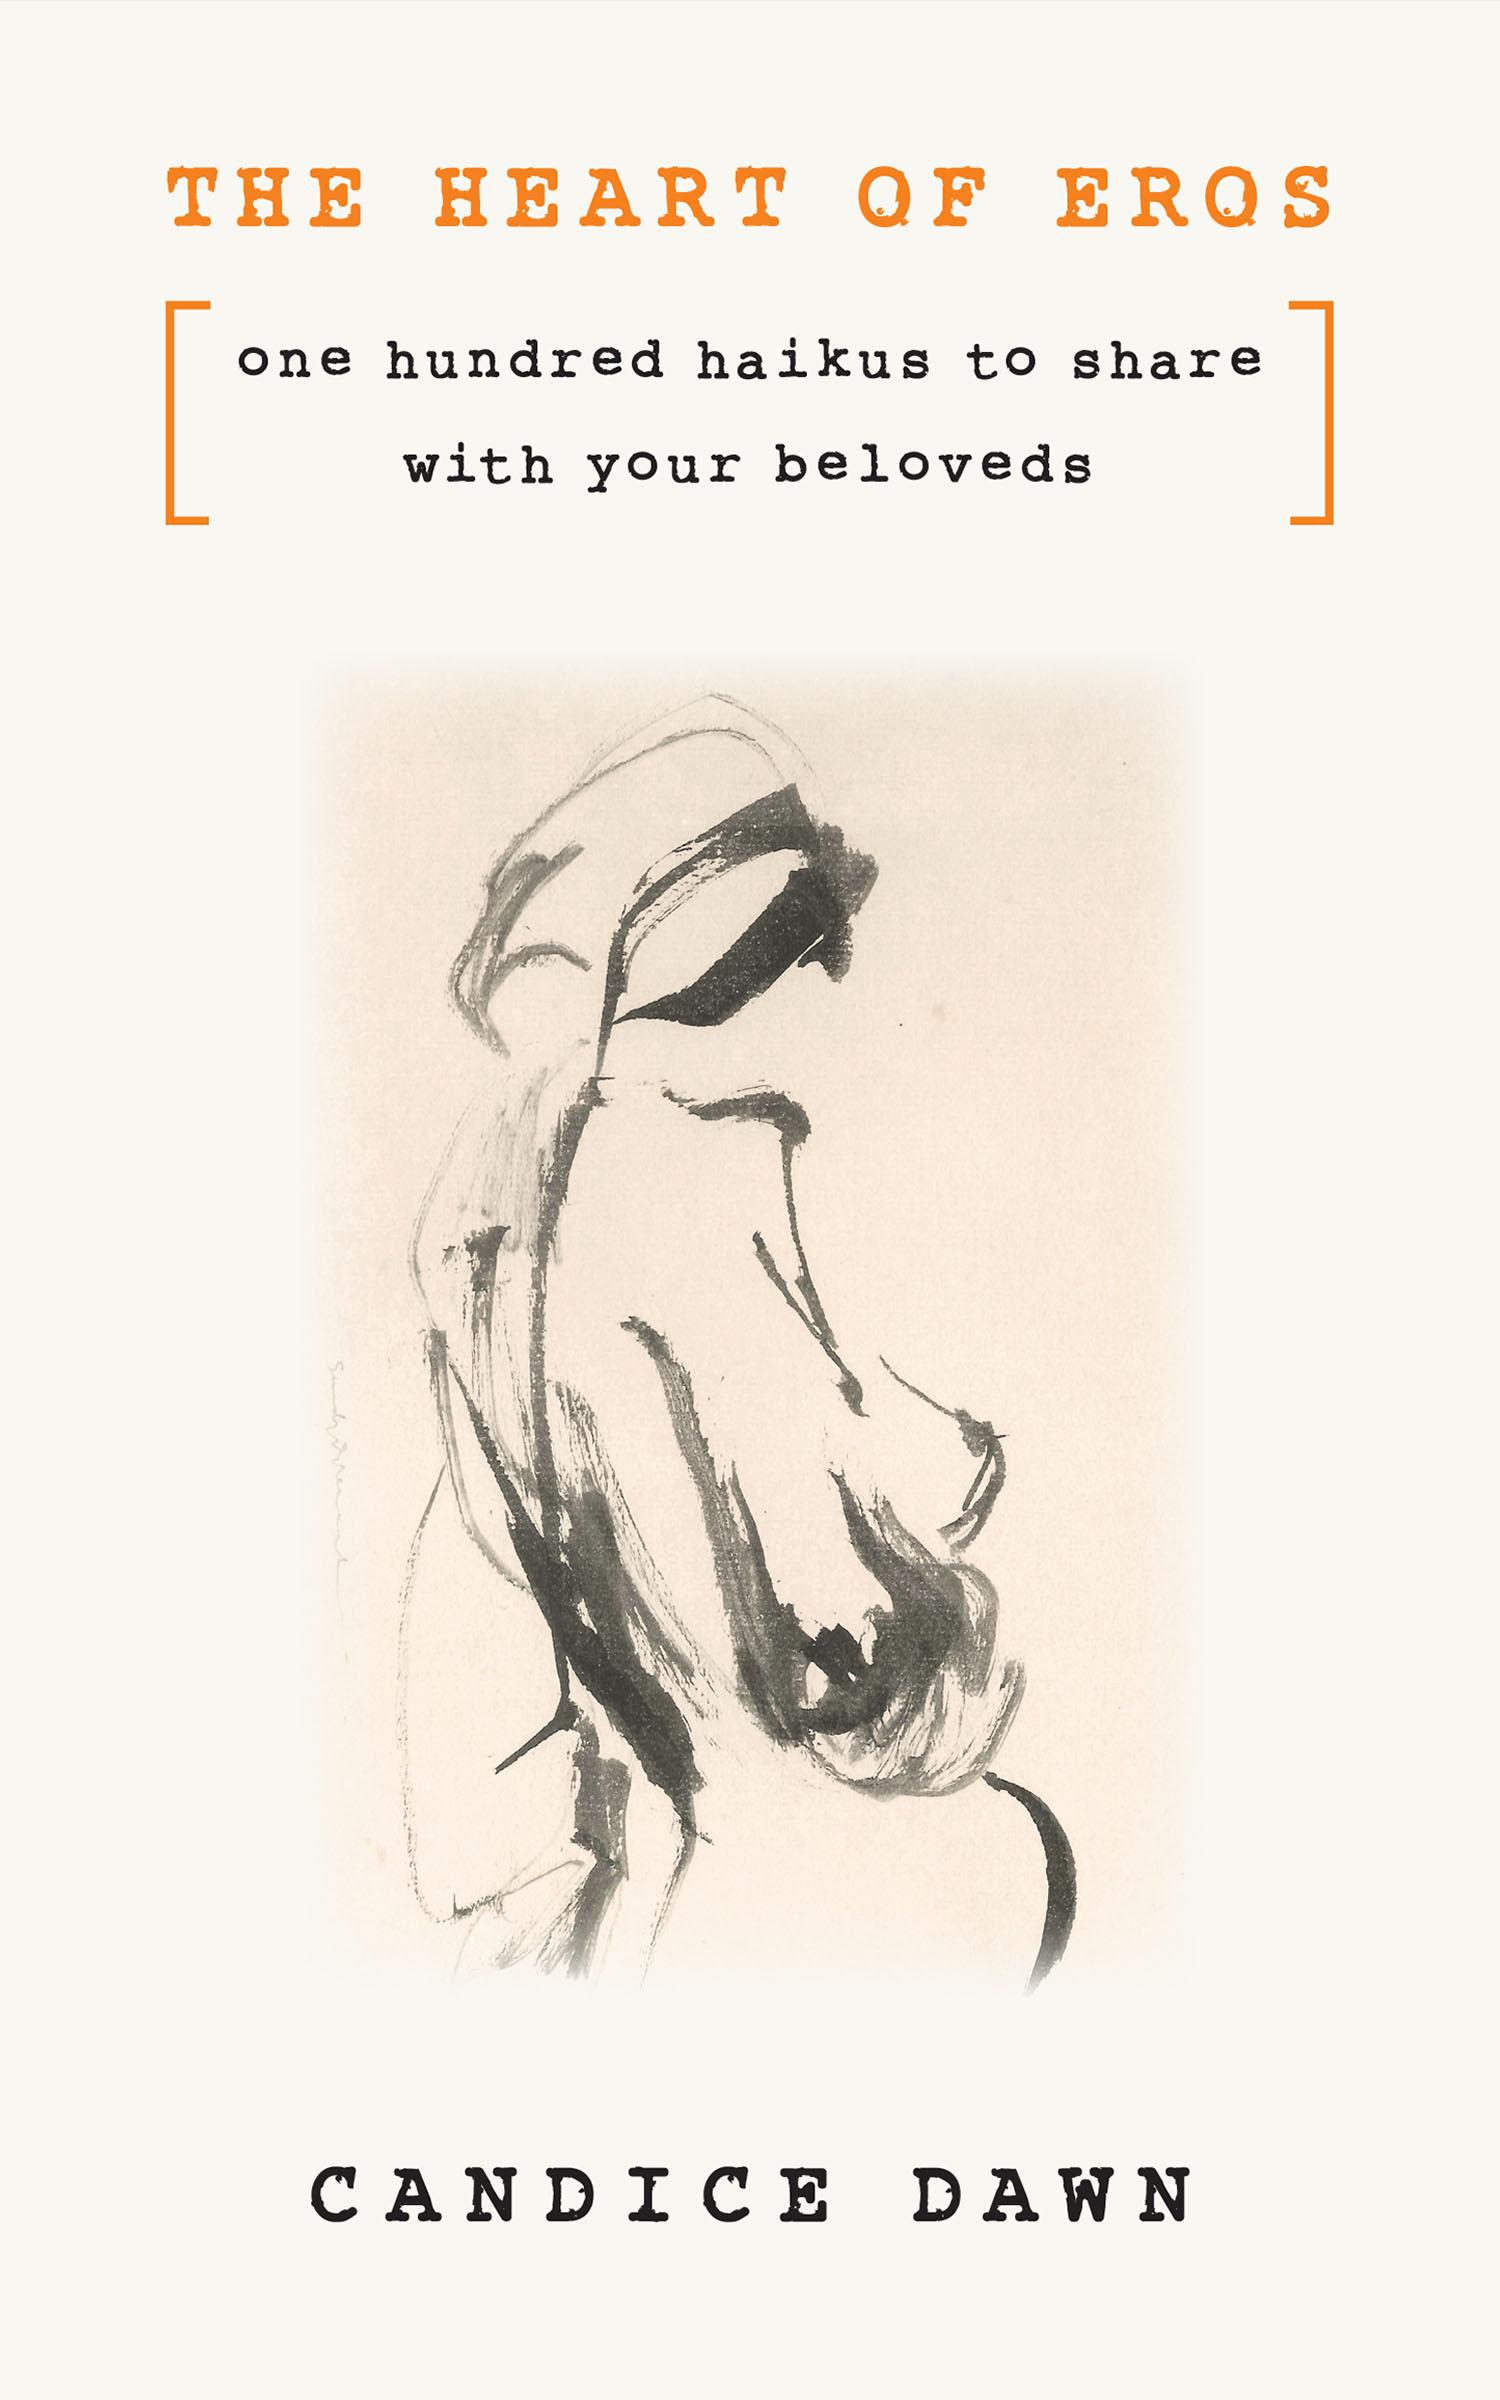 Heart of Eros Kindle cover.jpg